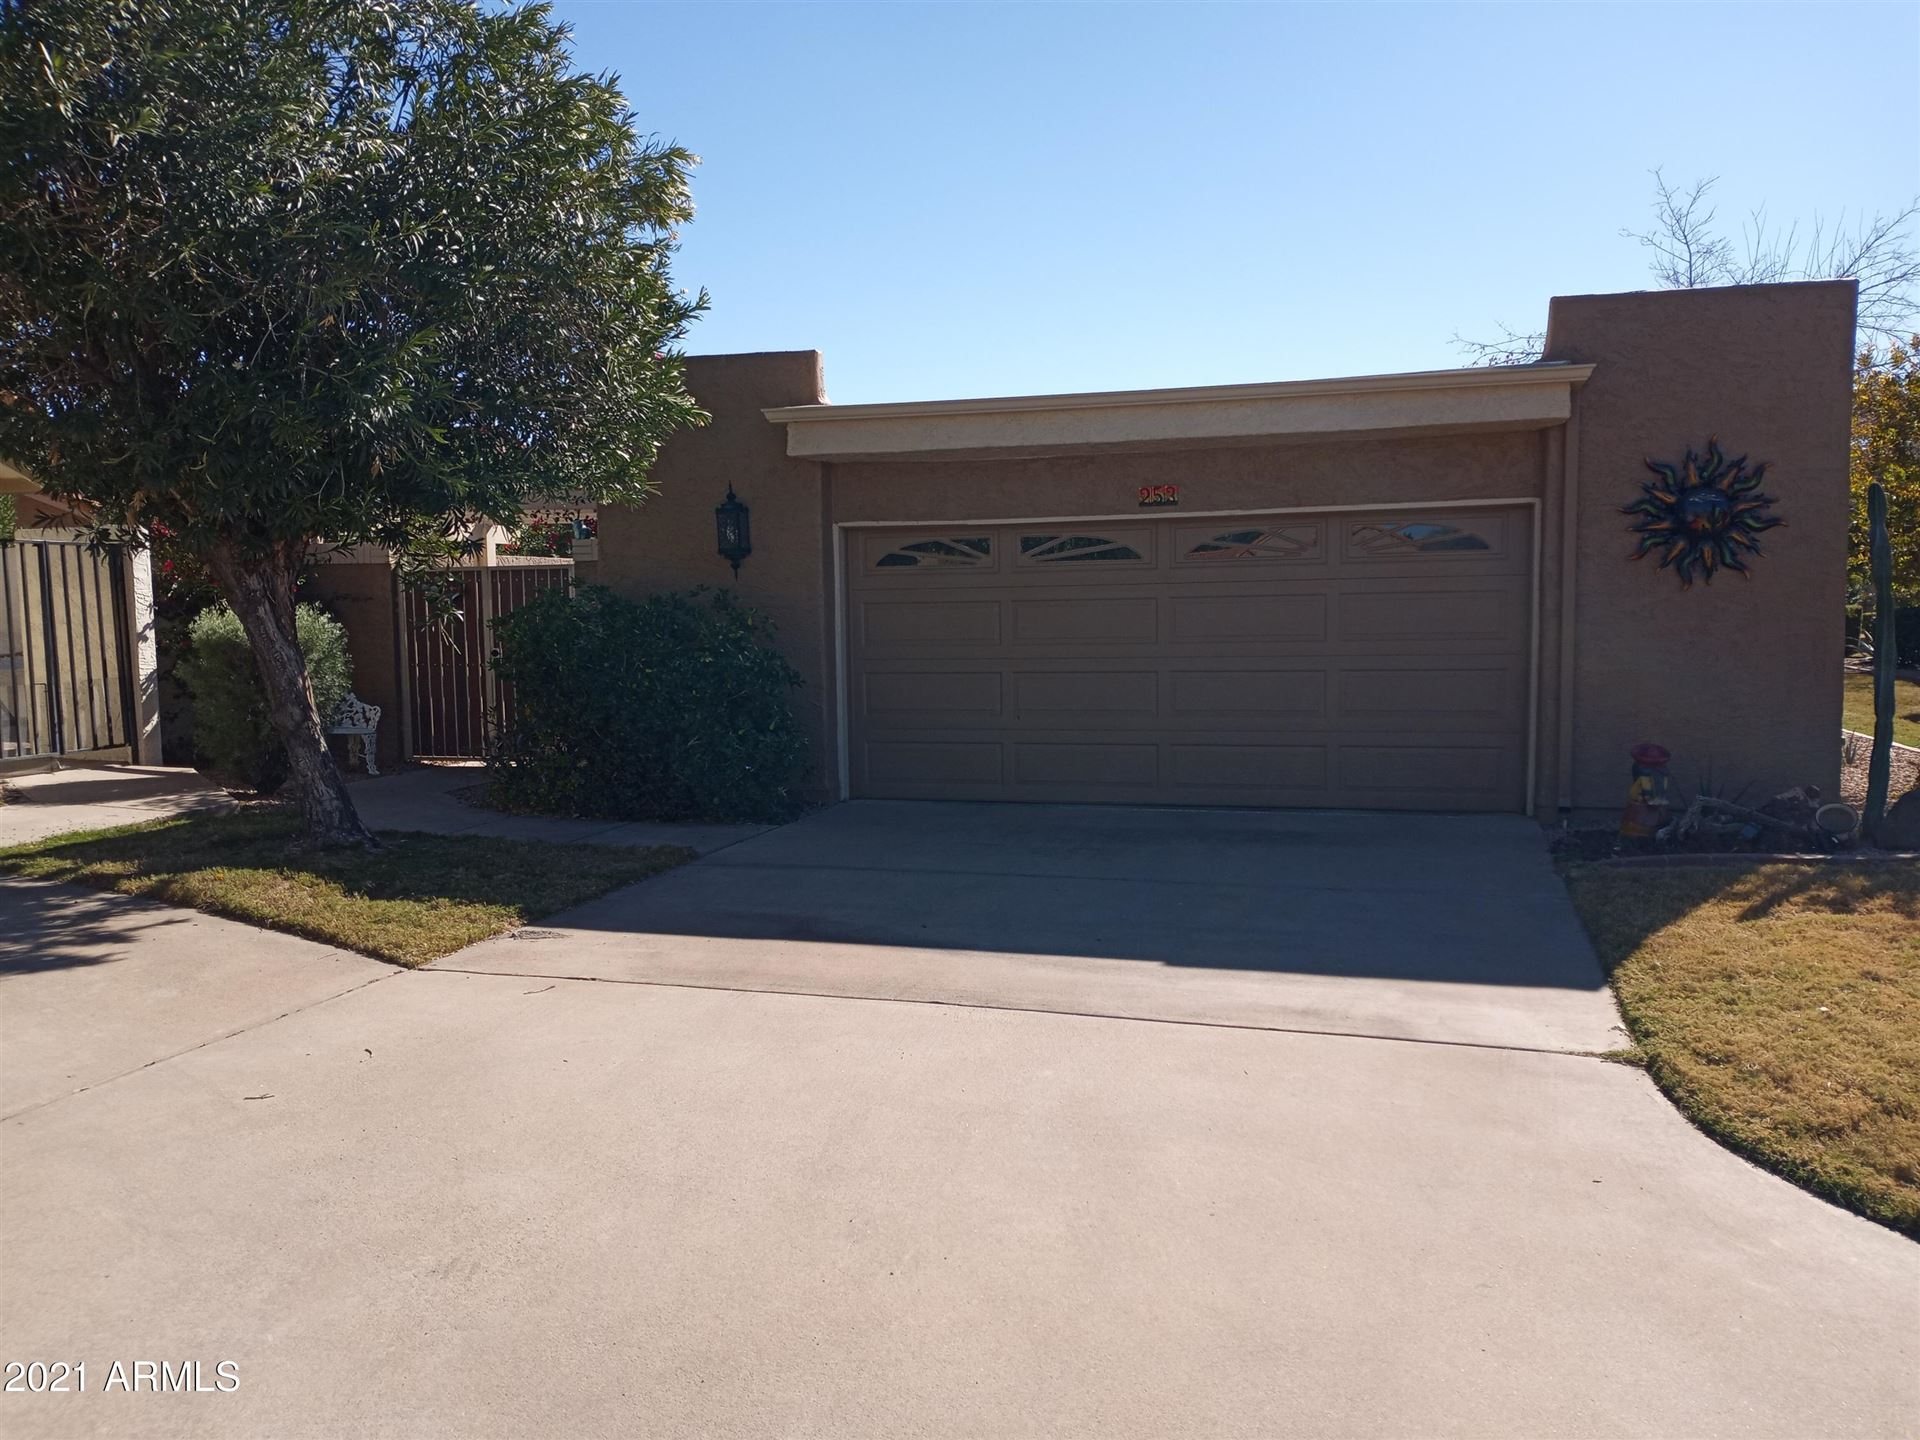 Photo of 253 LEISURE WORLD --, Mesa, AZ 85206 (MLS # 6200907)